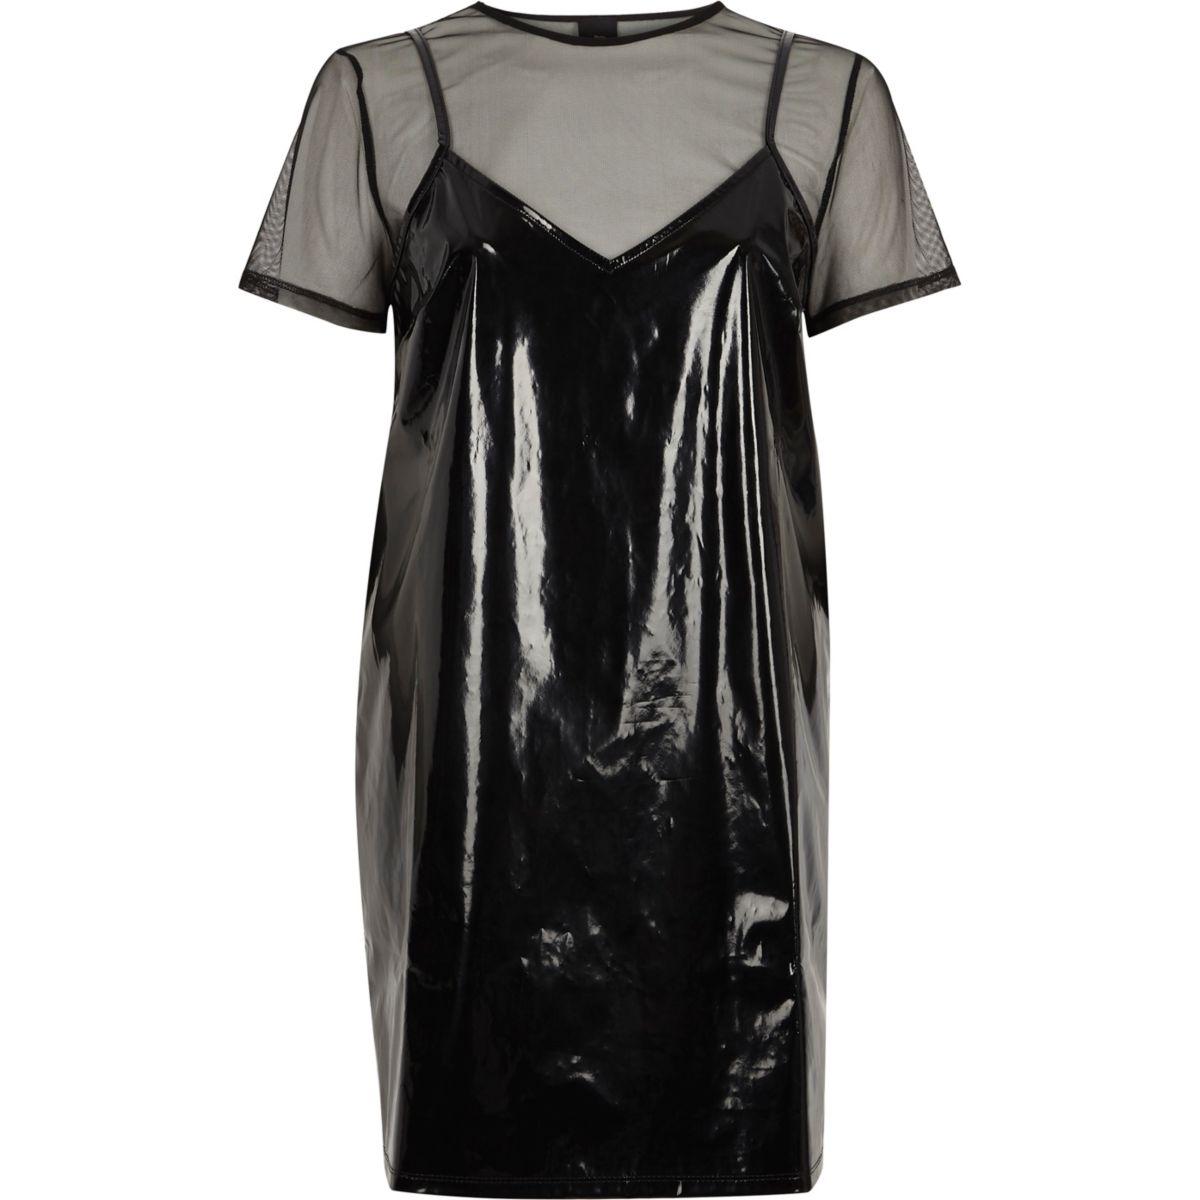 Black vinyl and mesh T-shirt dress